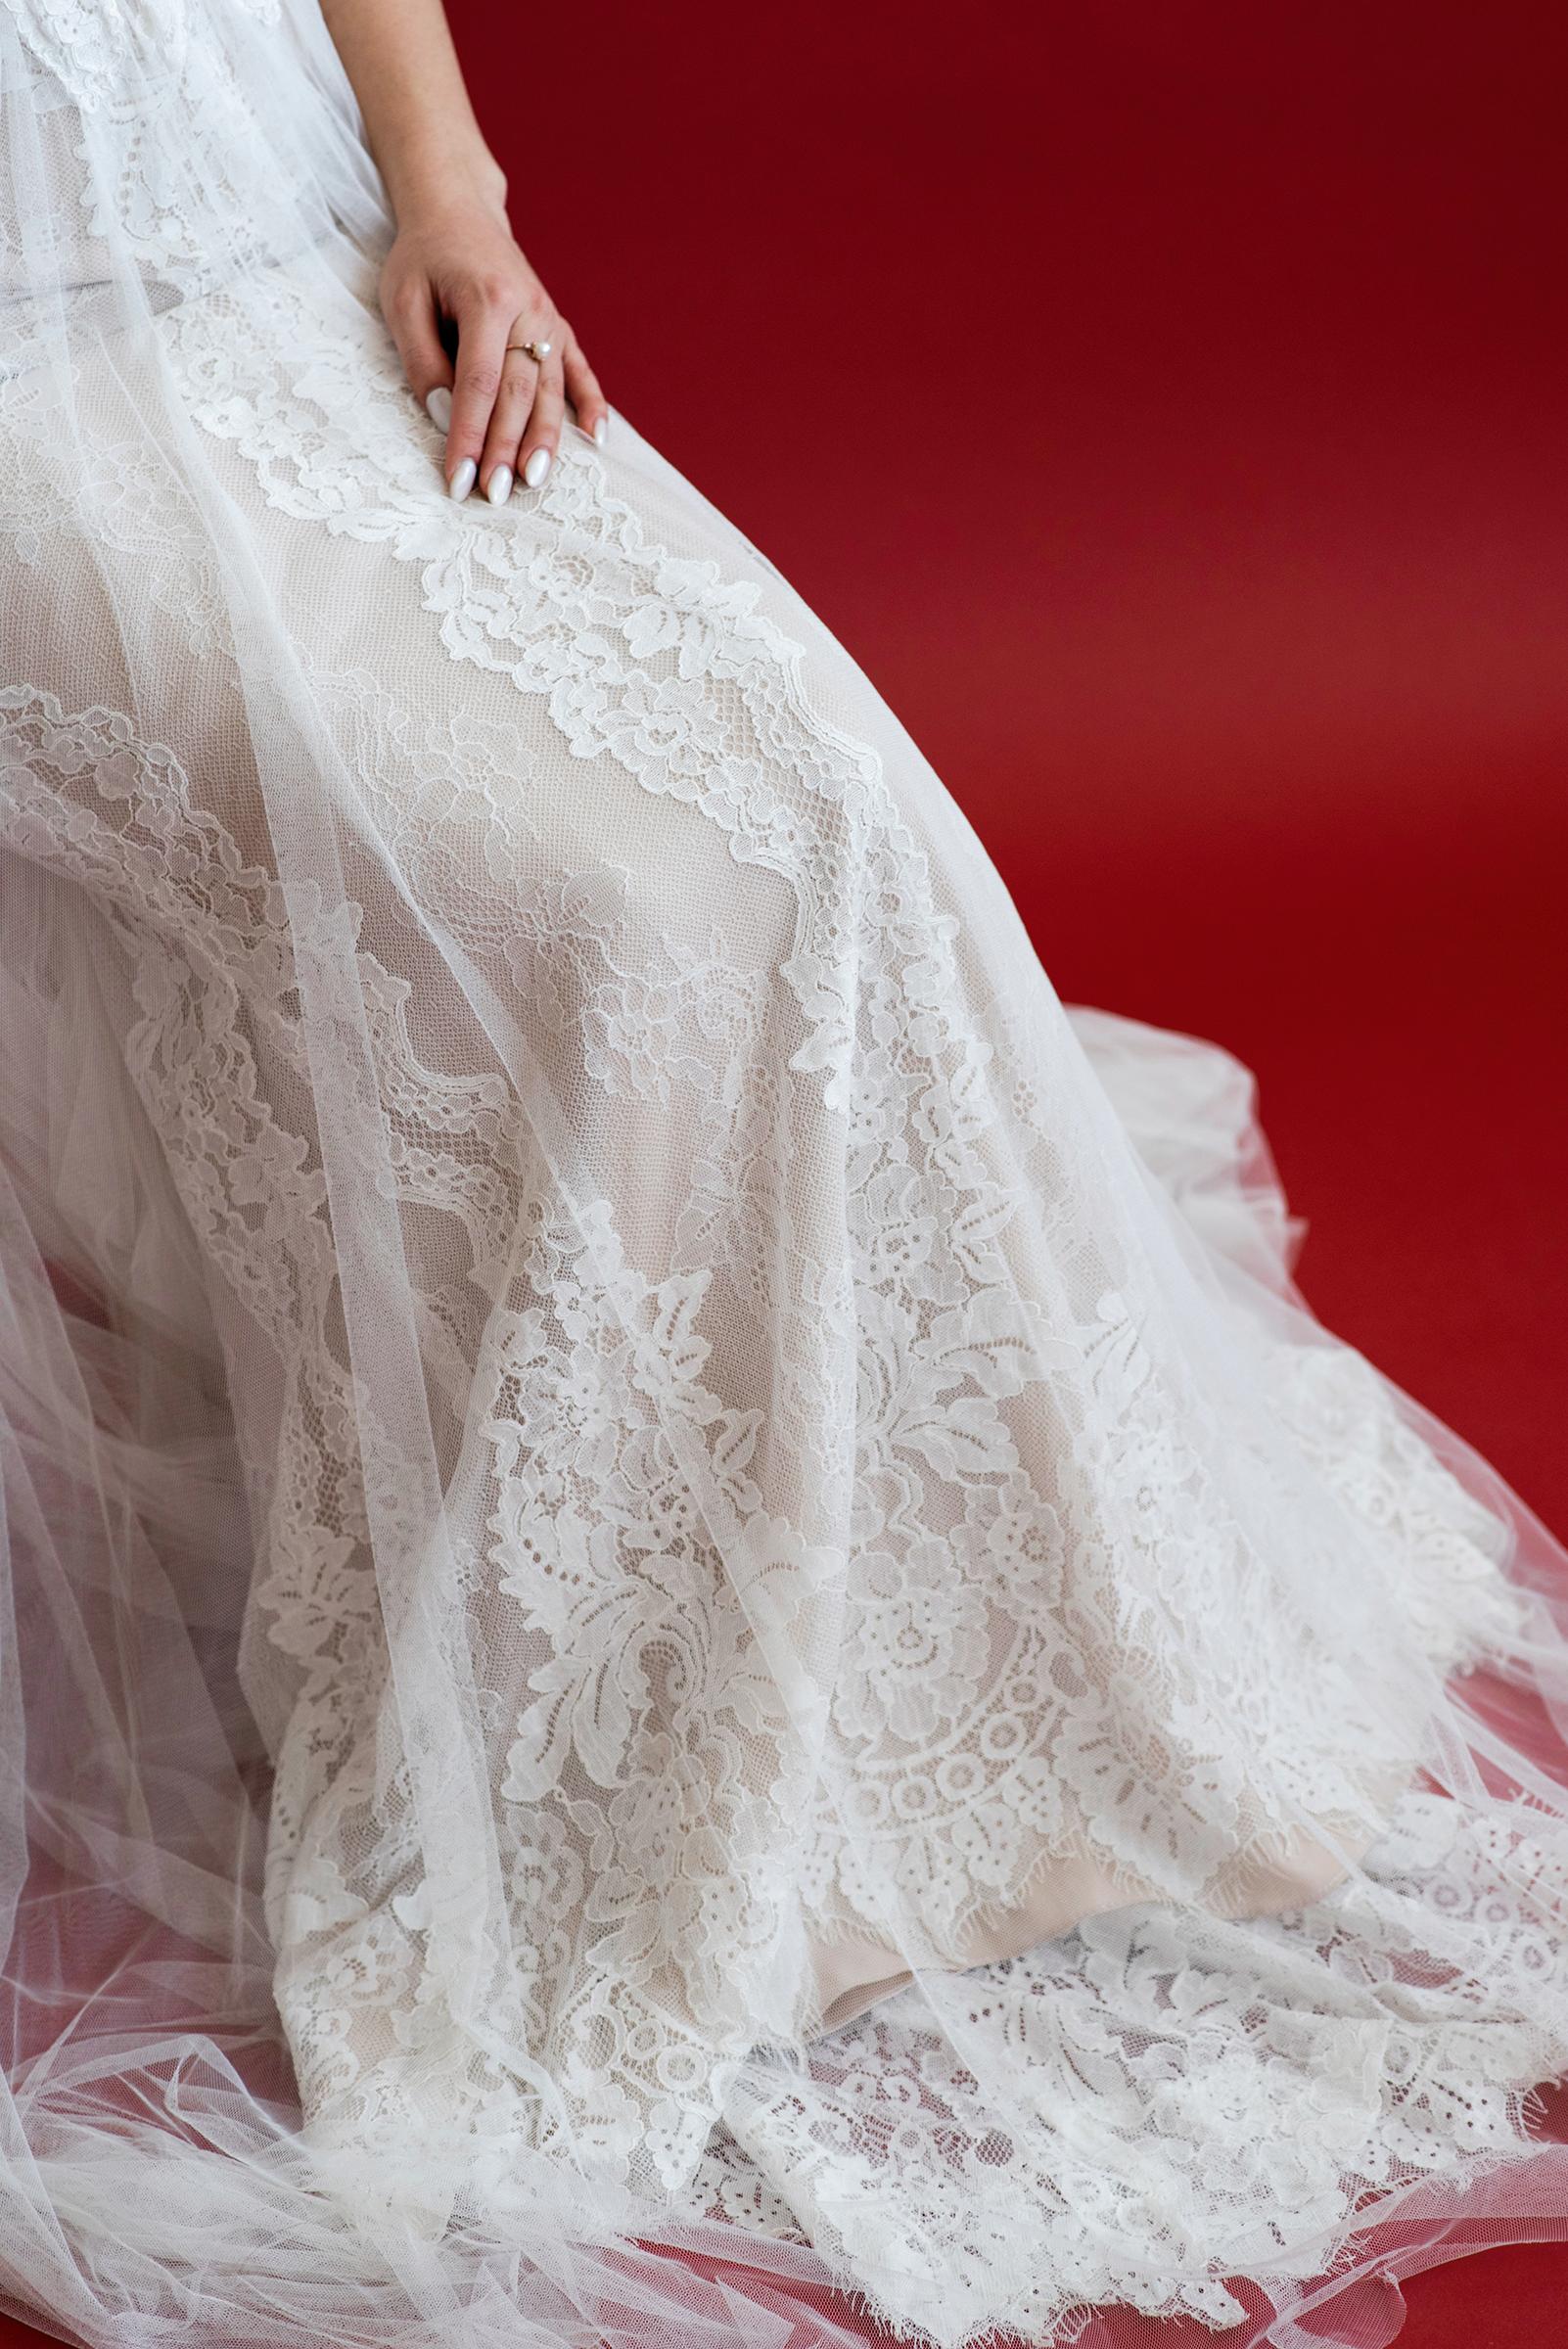 Stephanie-First Dress Details-3.jpg